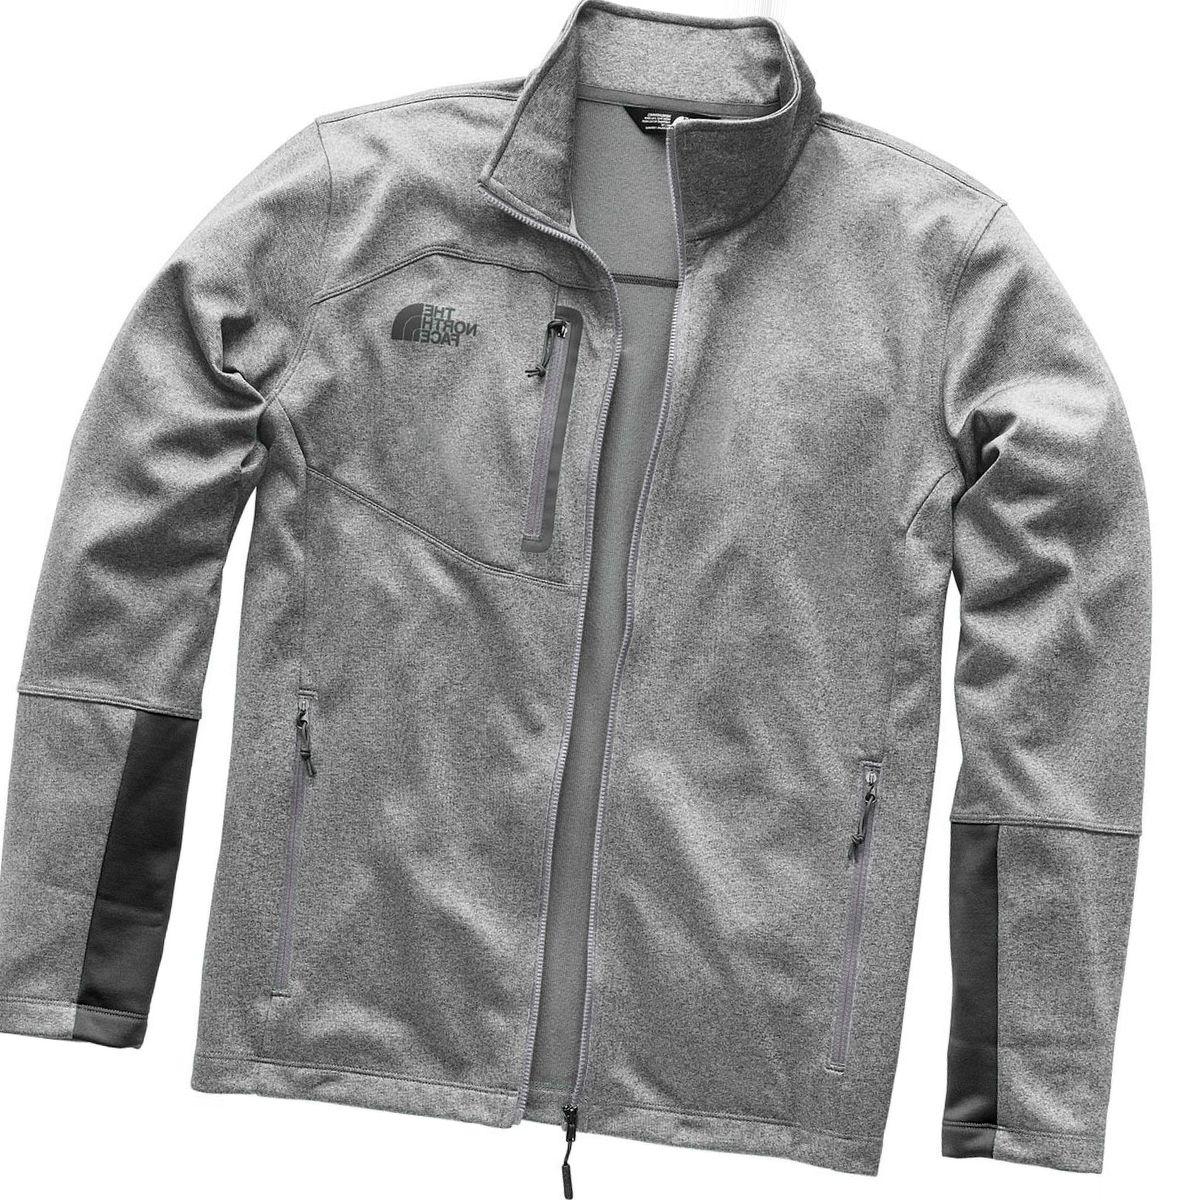 The North Face Canyonlands Fleece Jacket - Men's